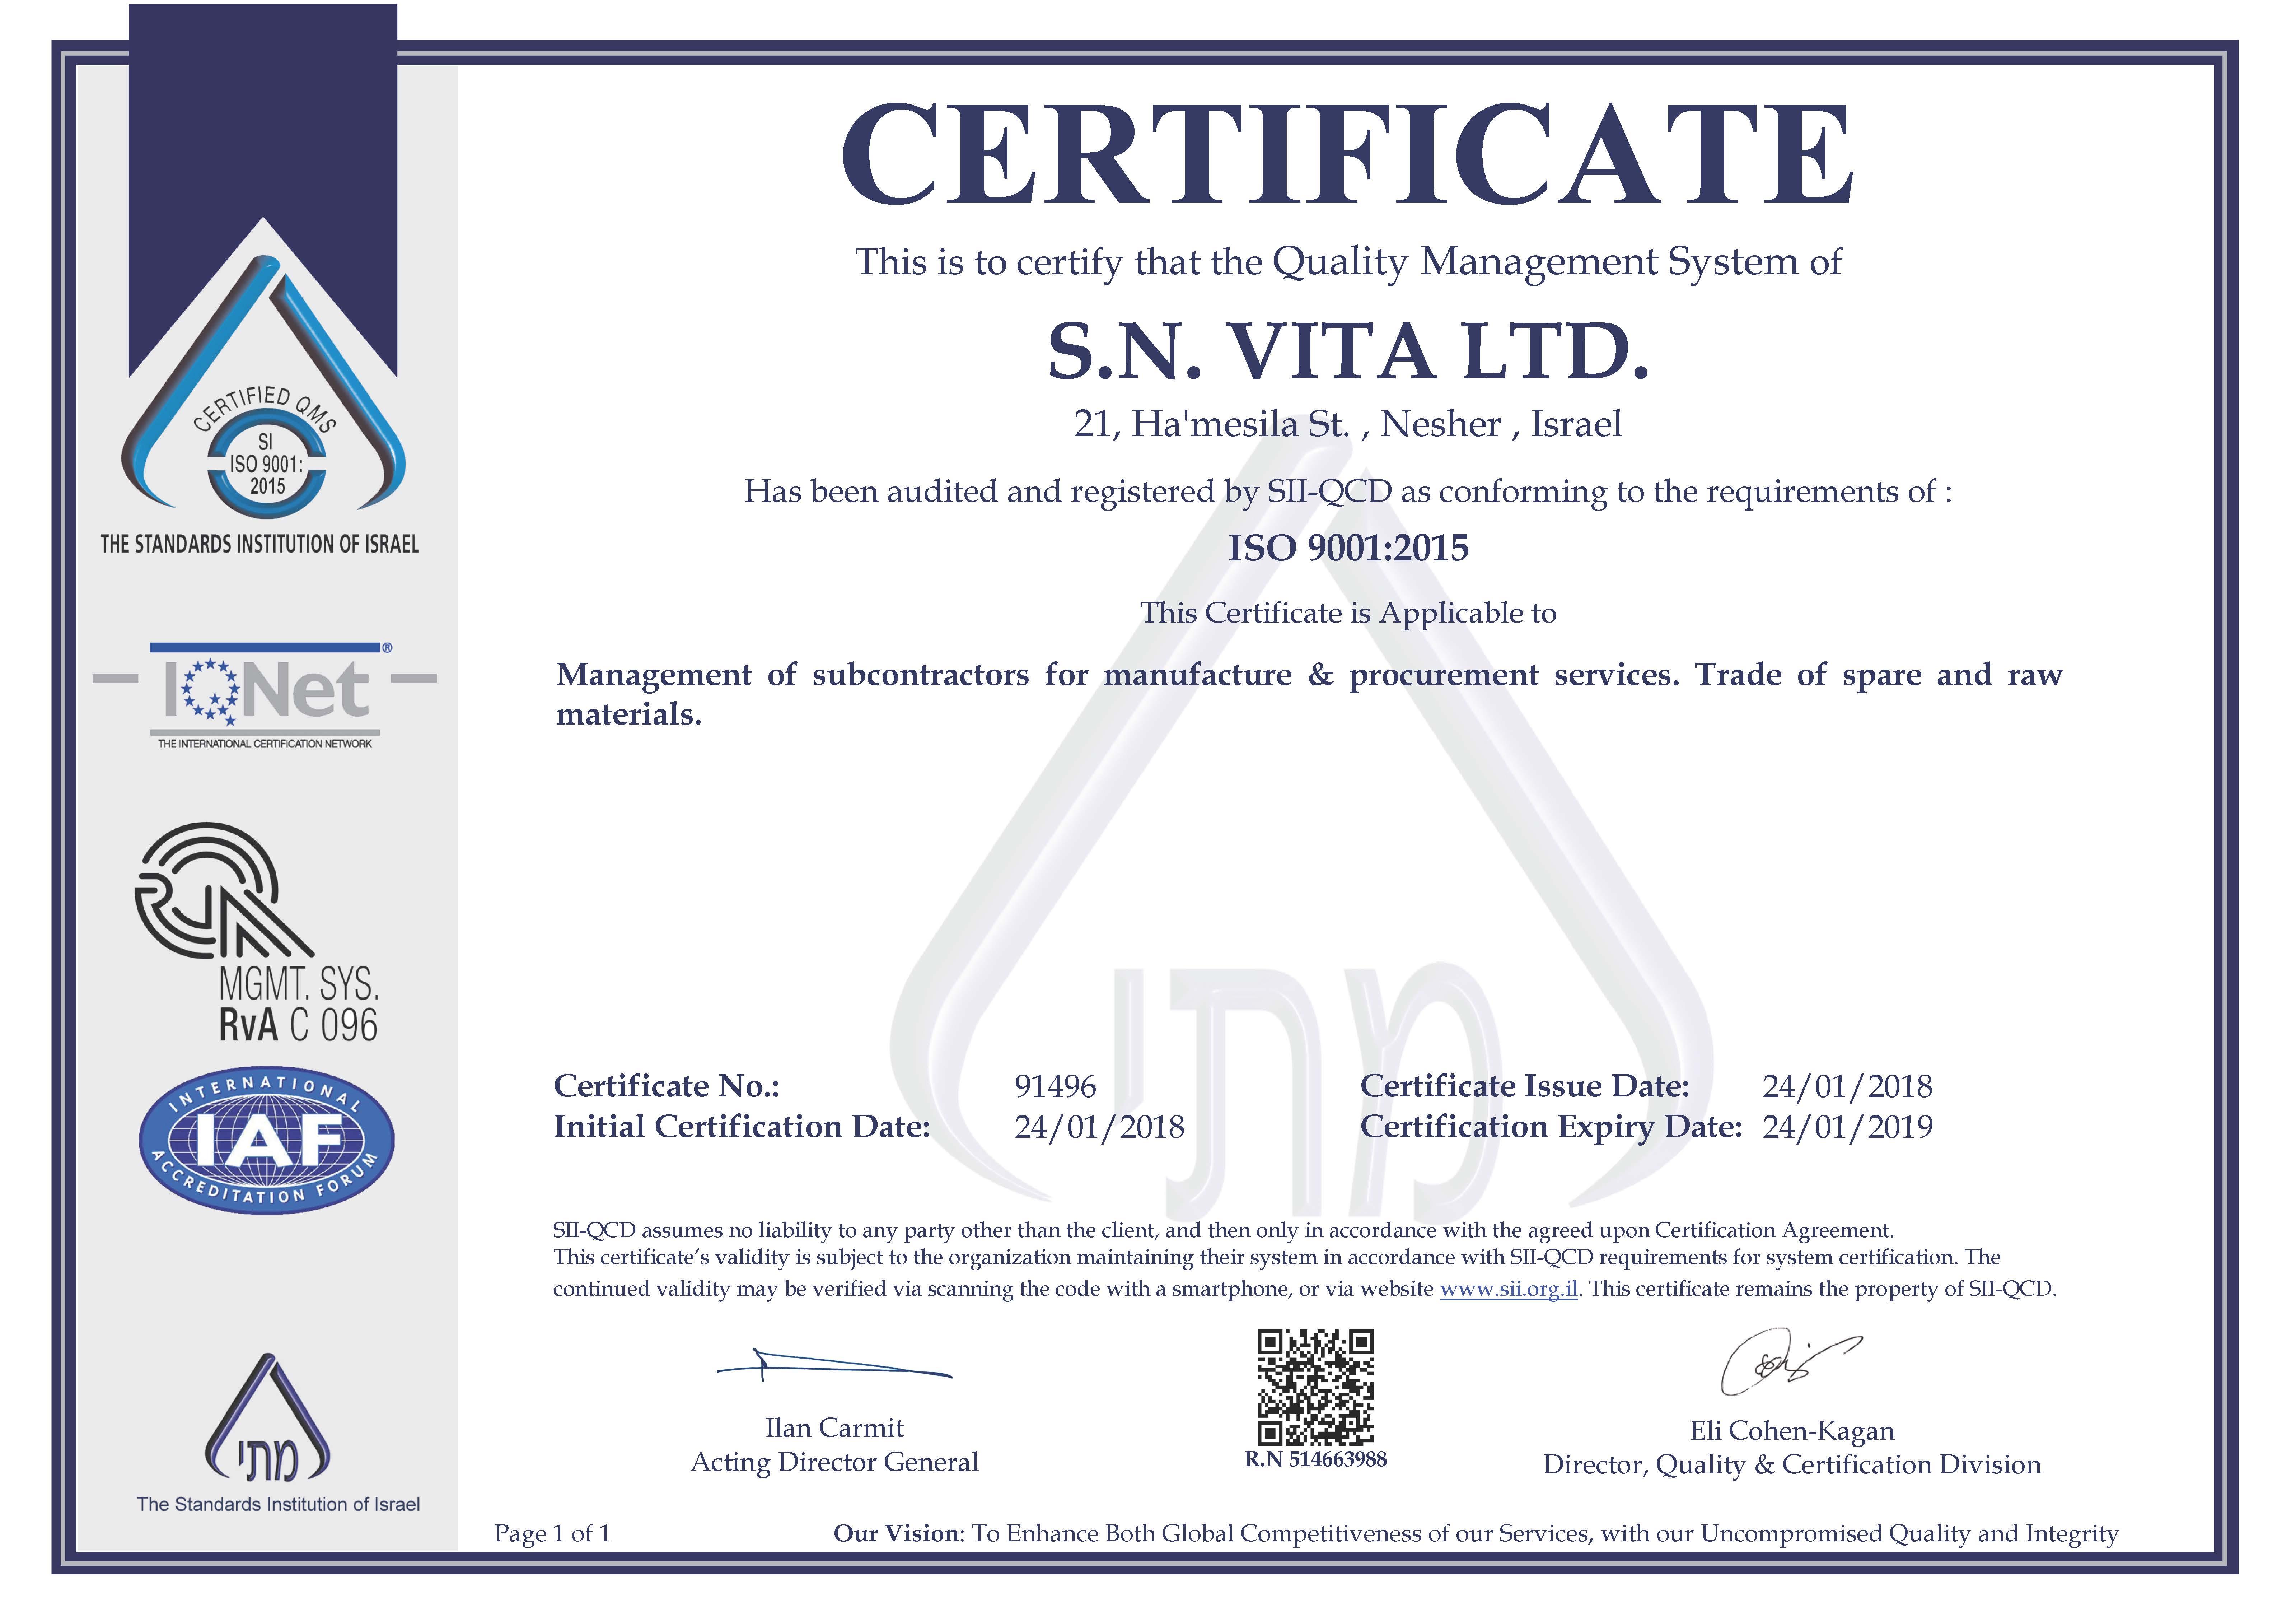 Certification Skynet Vita